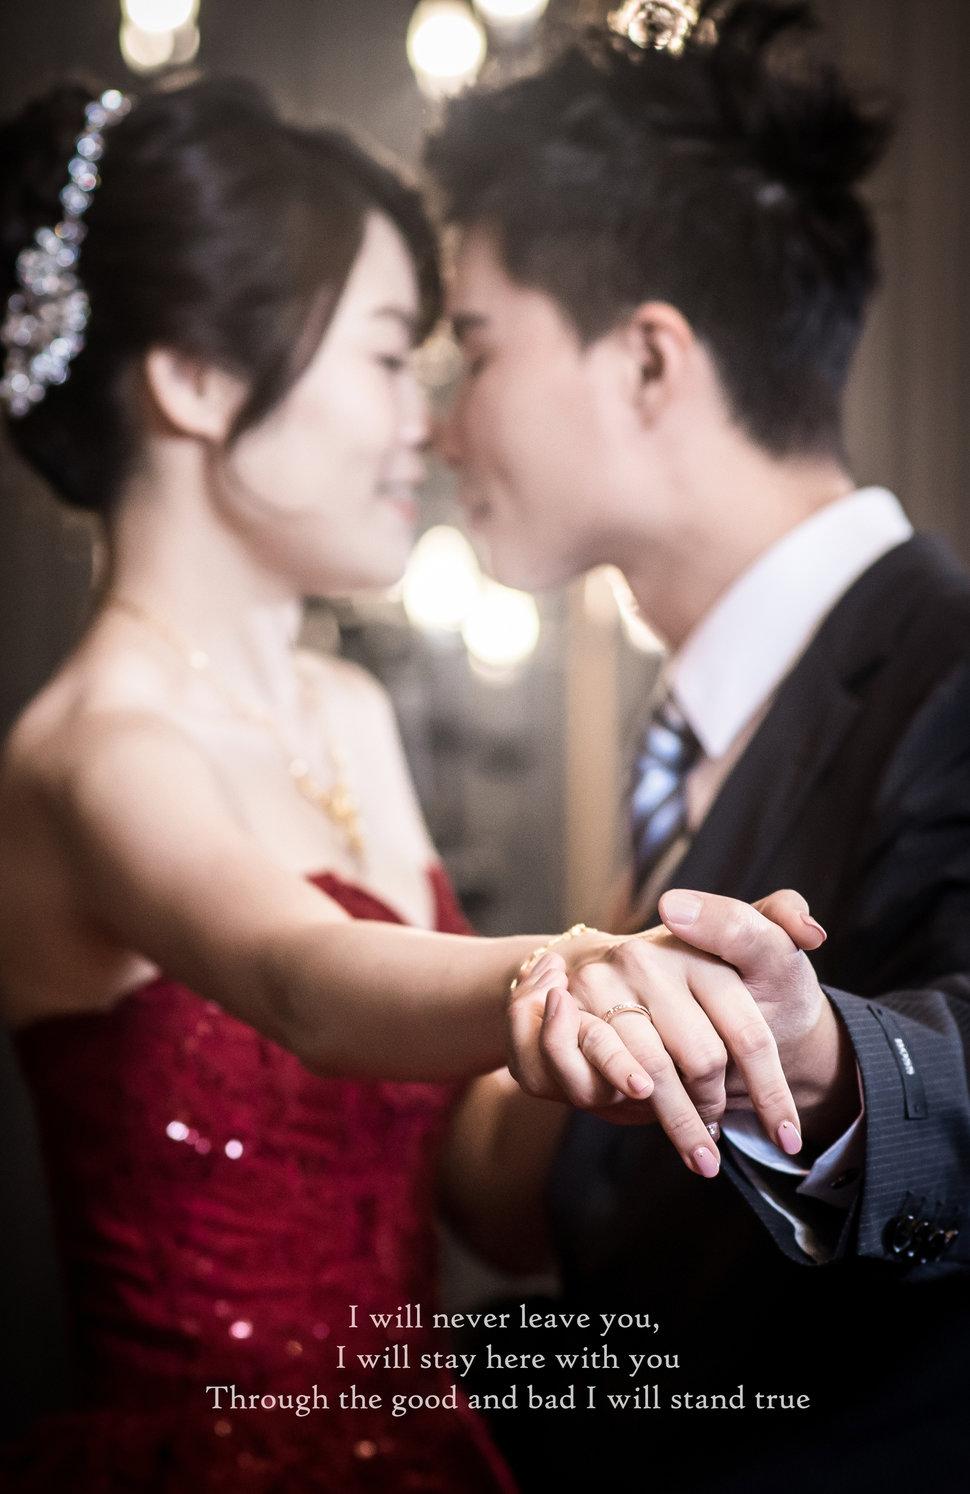 024 - My Darling 寵愛妳的婚紗《結婚吧》